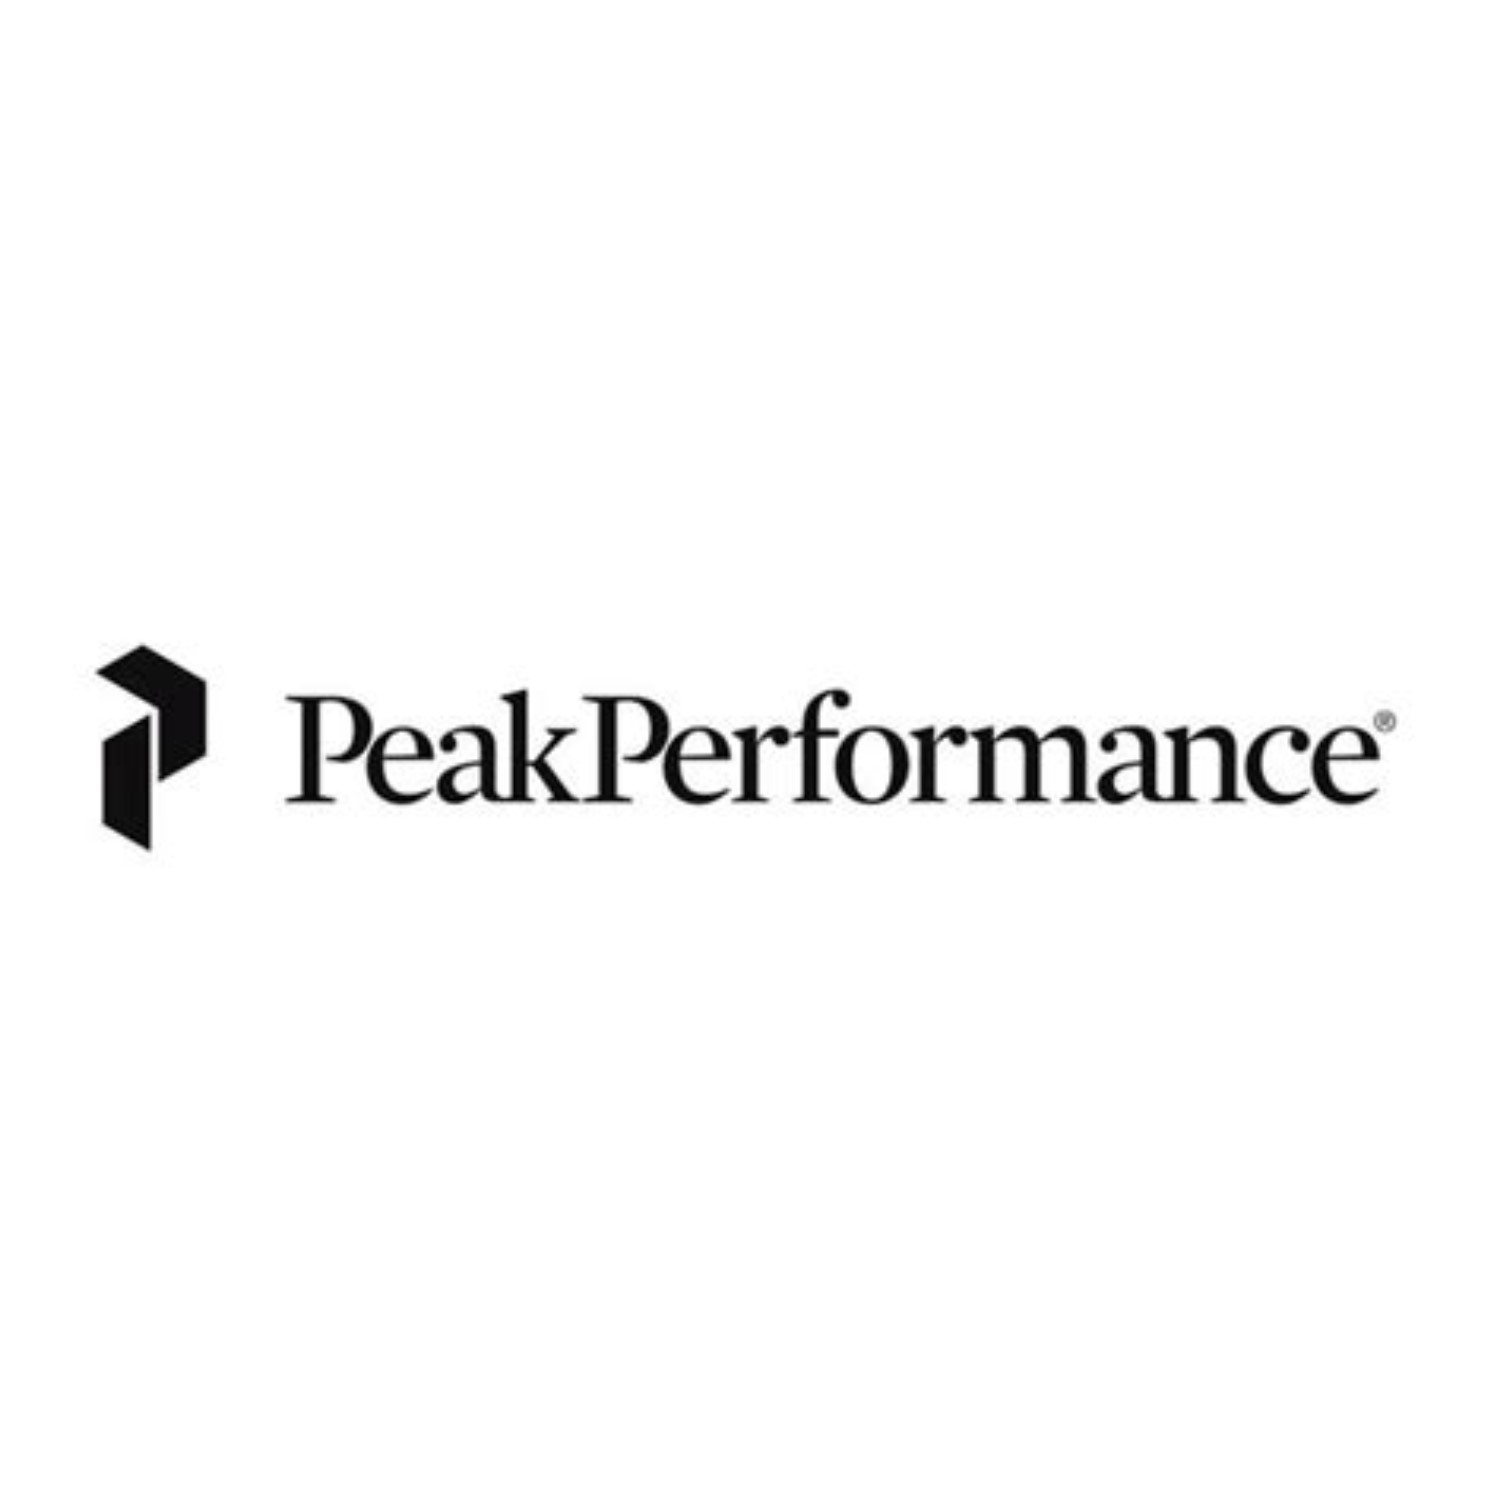 PeakPerformance Logo